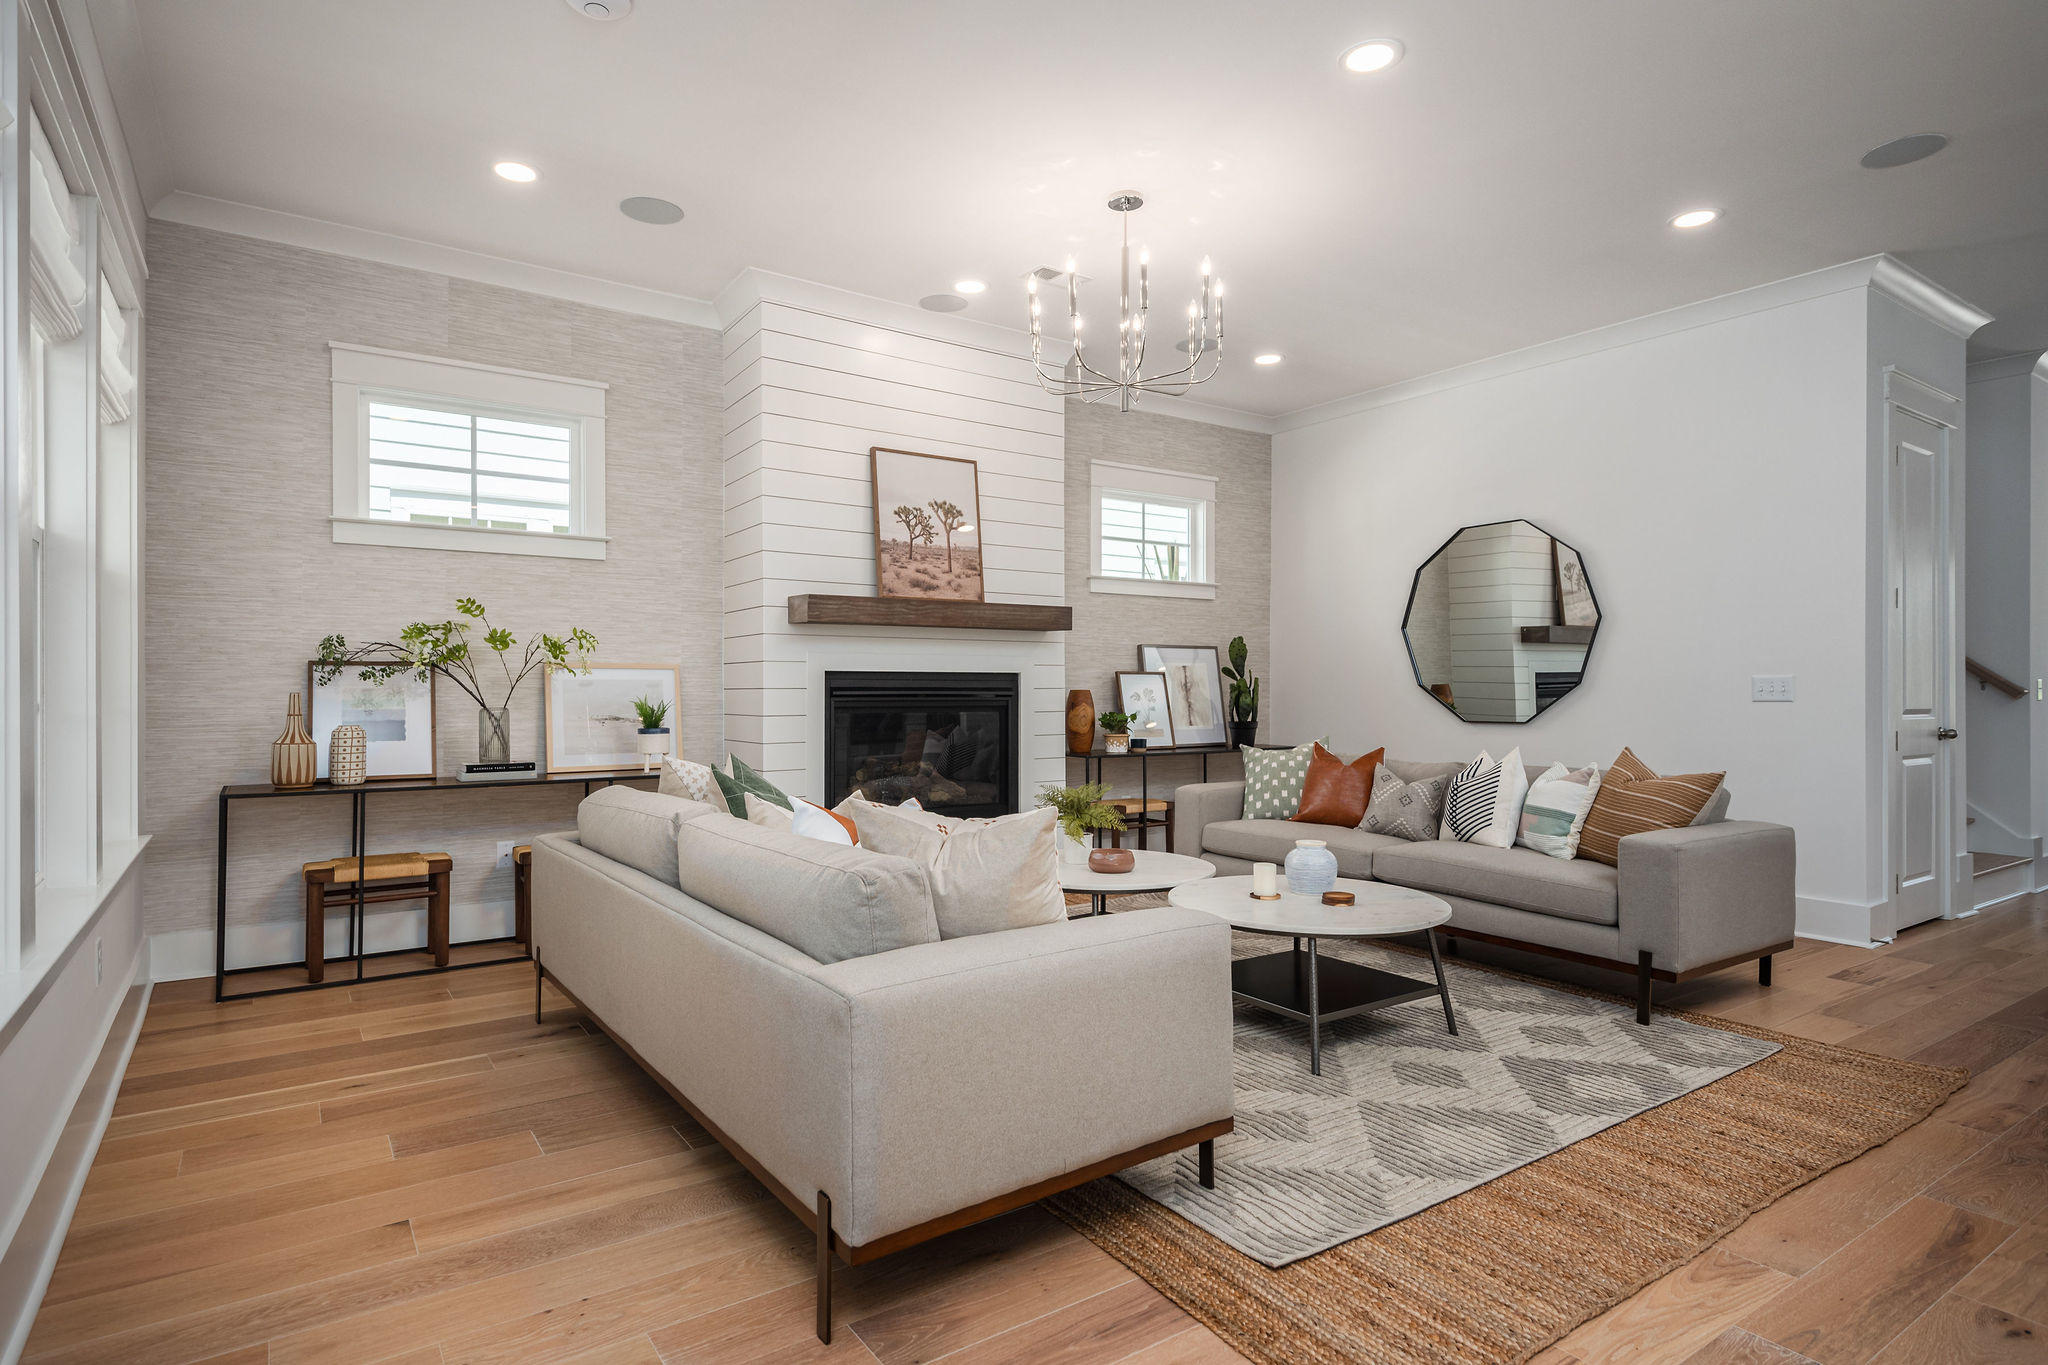 Midtown Homes For Sale - 1533 Kepley, Mount Pleasant, SC - 38